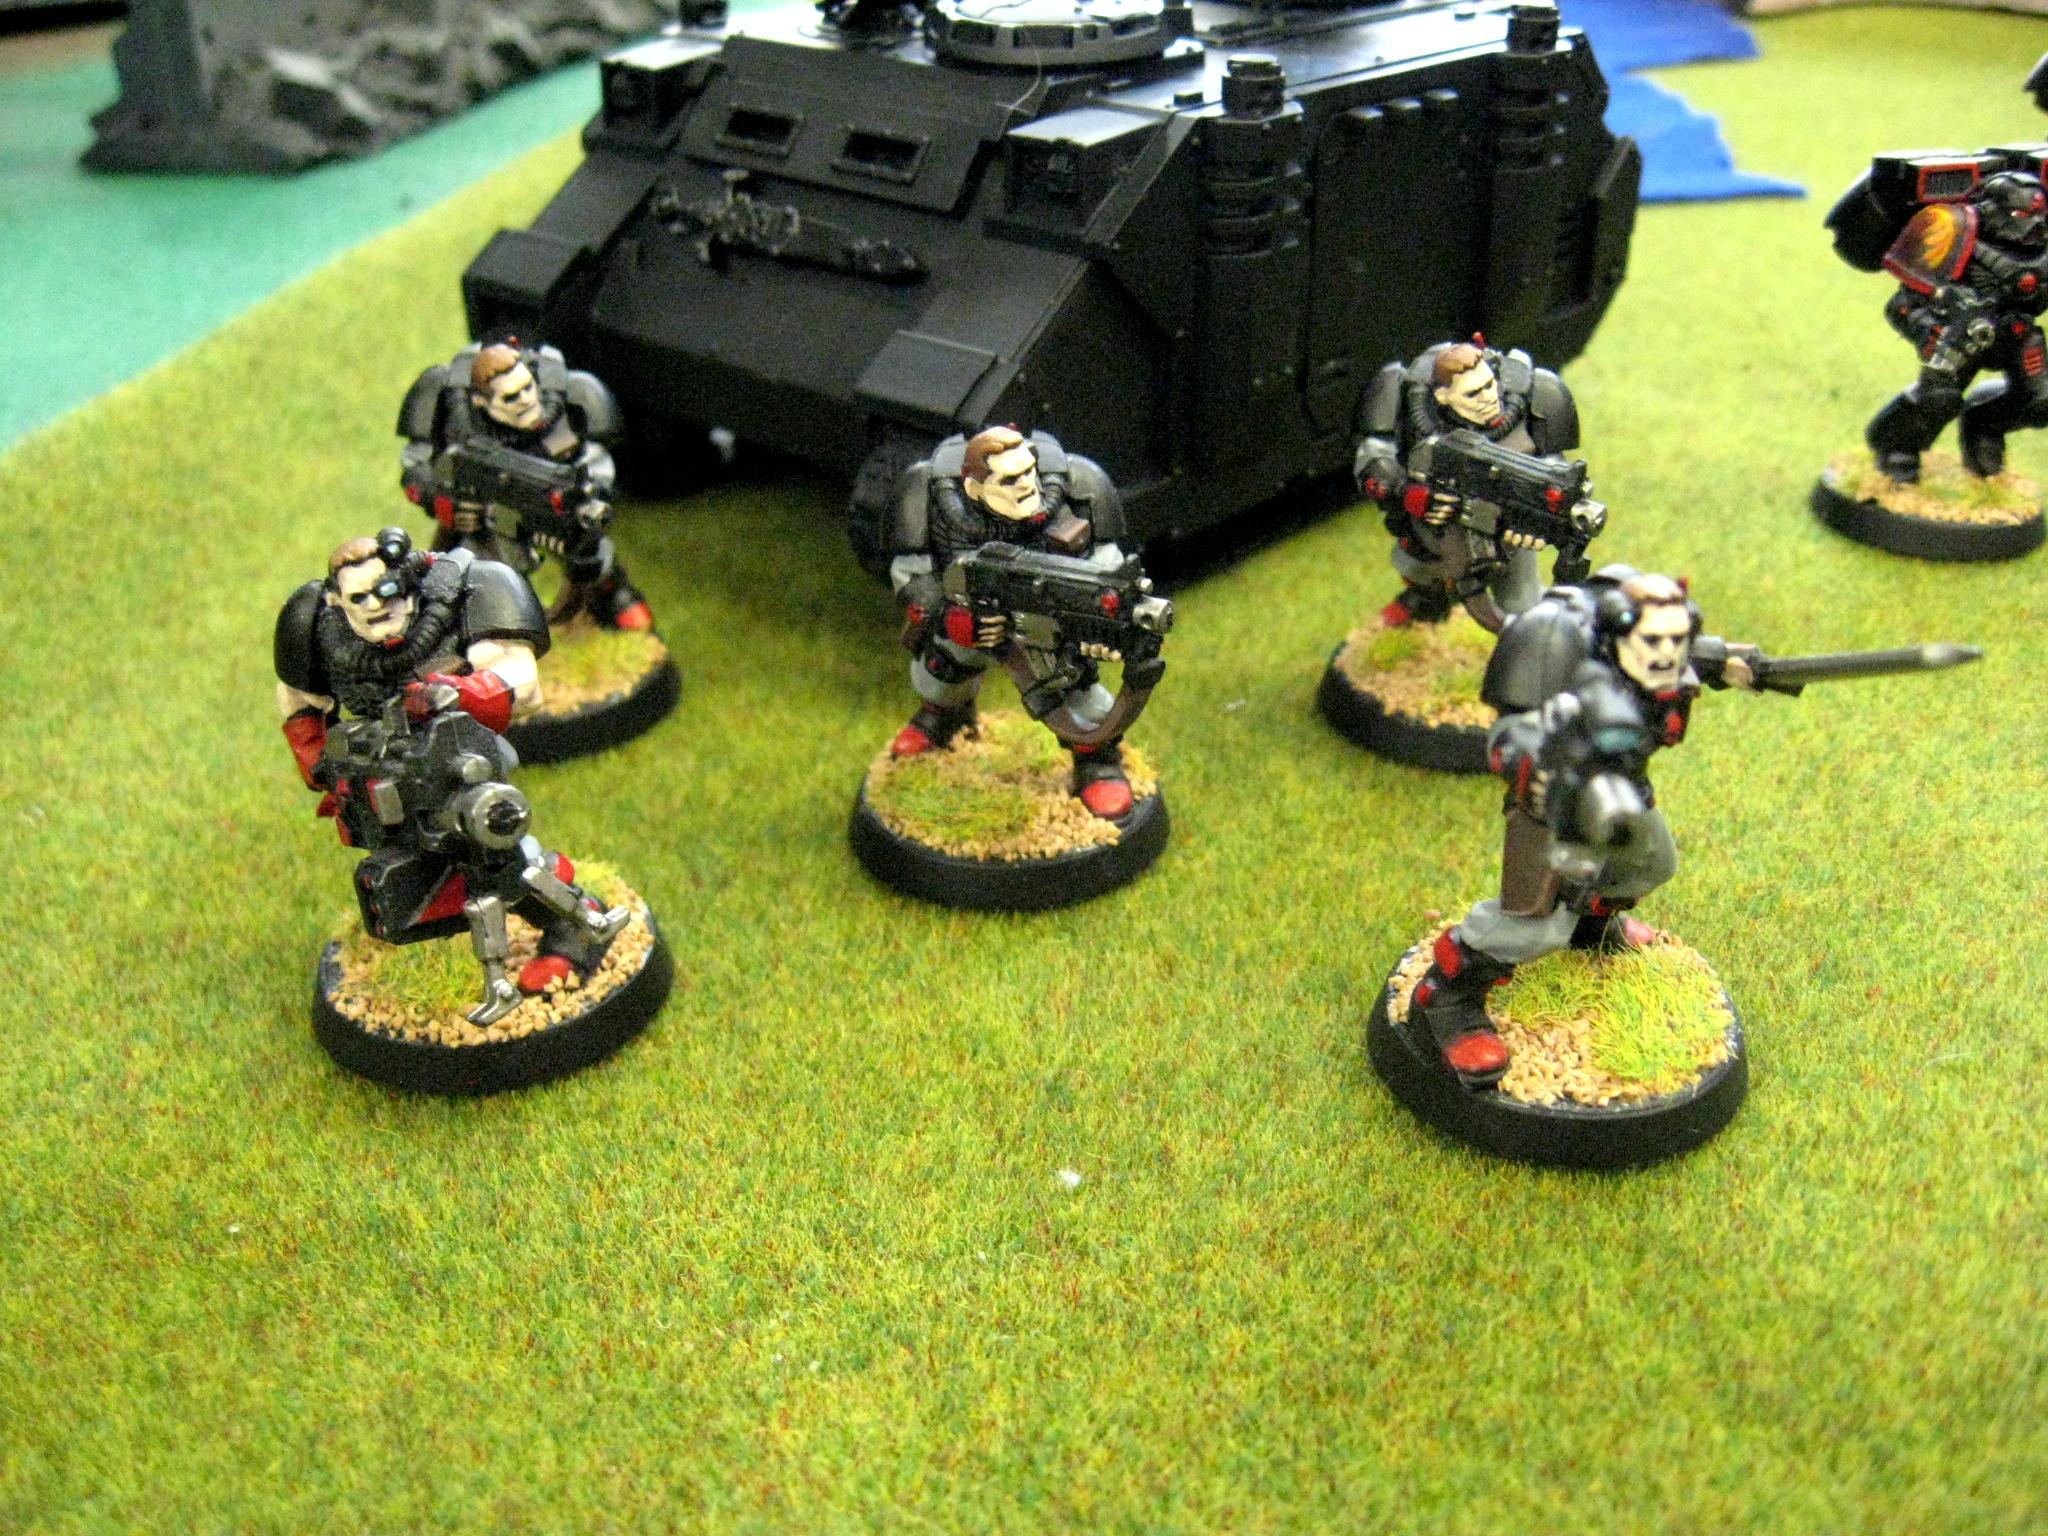 Chapter, Custom, Dreadnought, Land Raider, Predator, Rhino, Salamanders, Scouts, Space Marines, Squad, Tactical, Terminator Armor, Vanilla, Vulkan